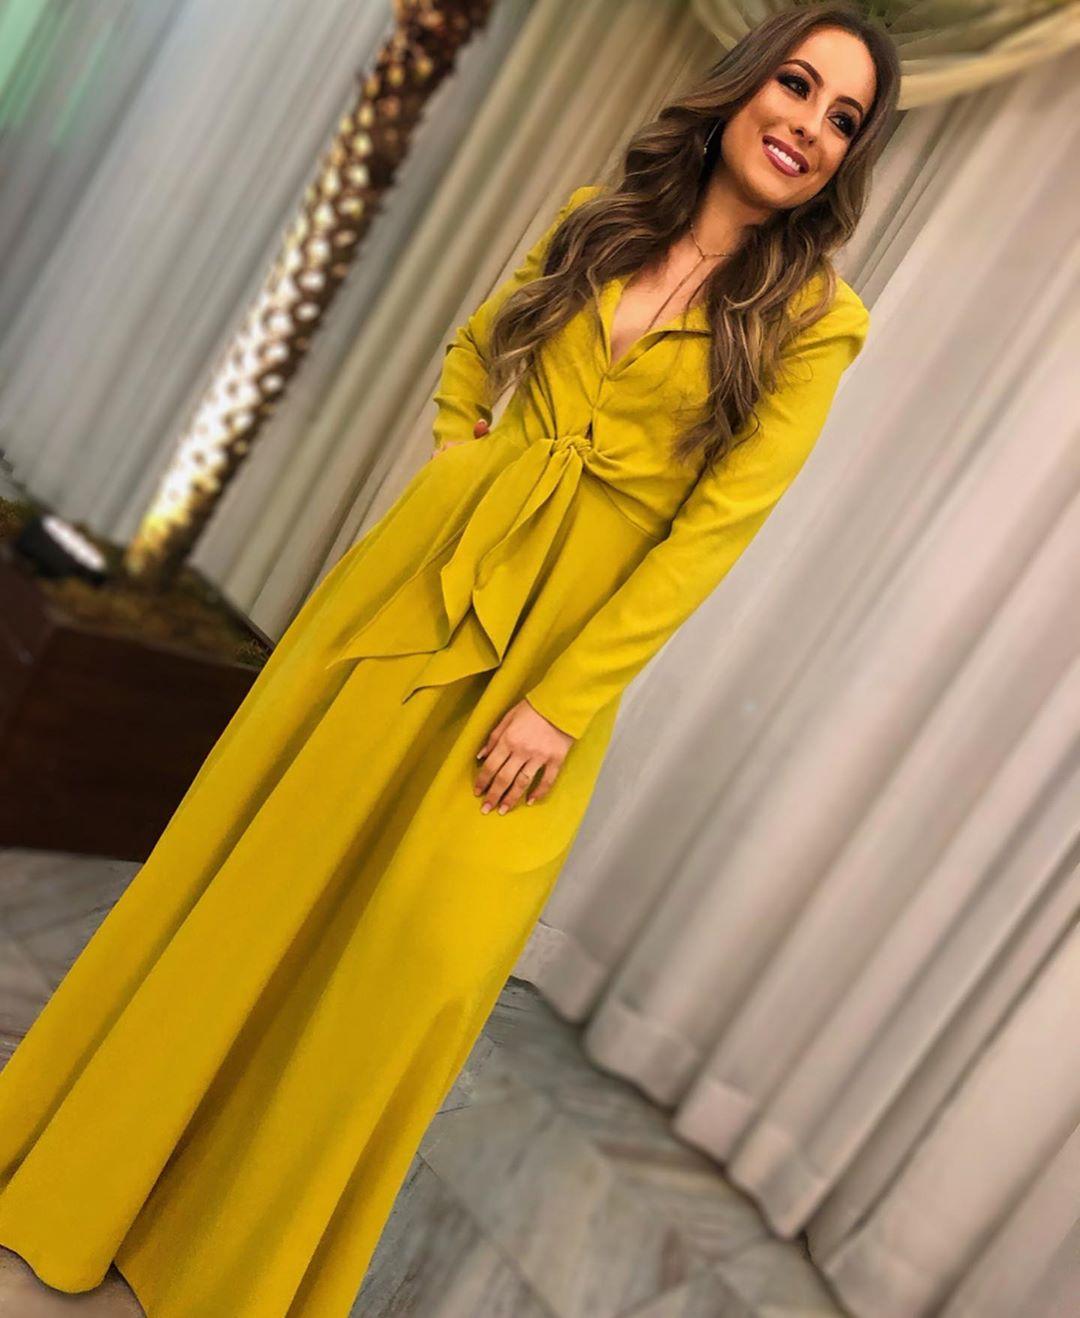 cristine boff sartor, segunda finalista de miss latinoamerica 2019. - Página 6 66427110